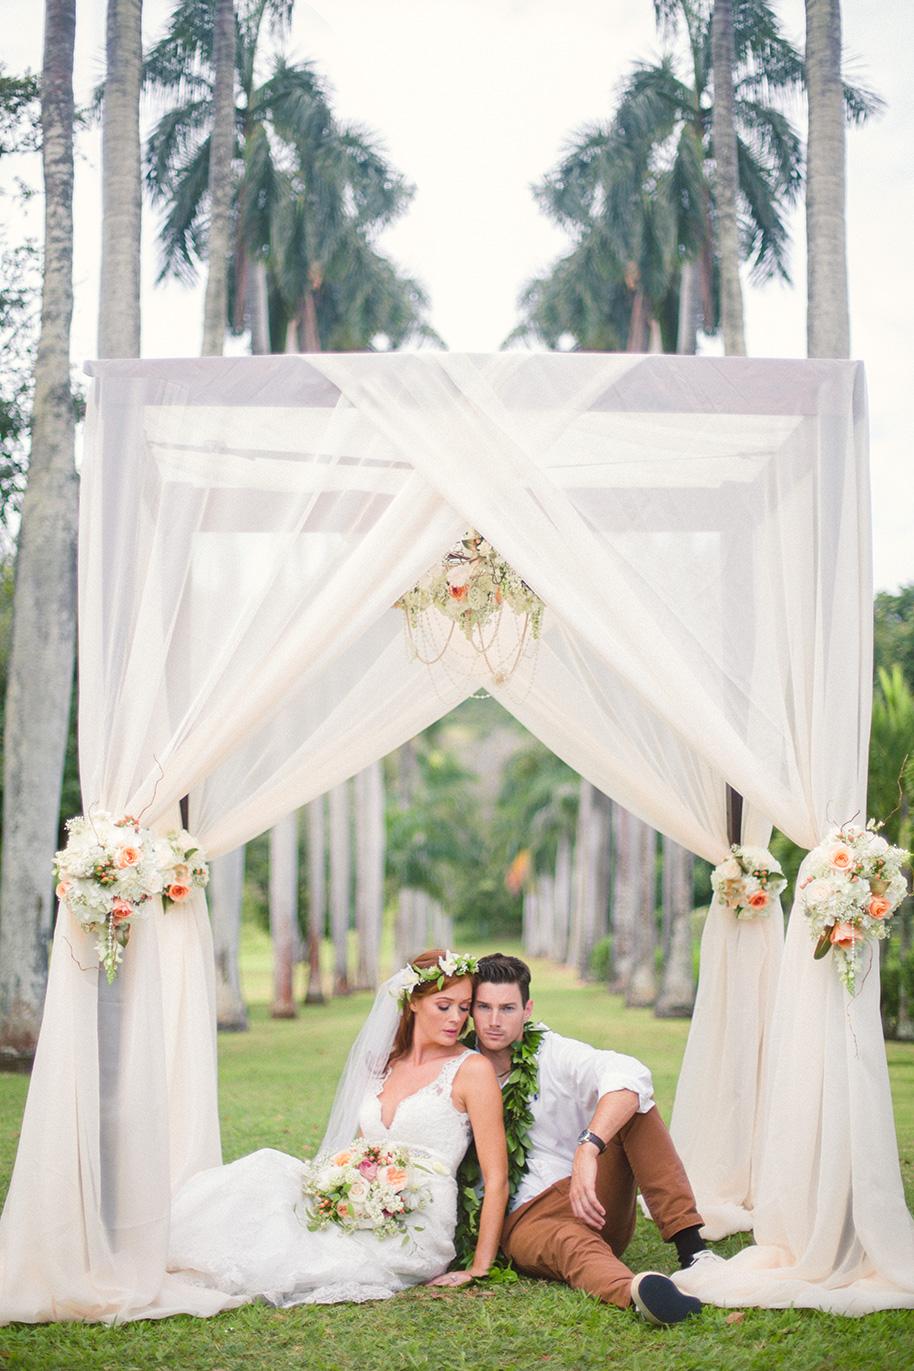 Dillingham-Ranch-Wedding-040516-18